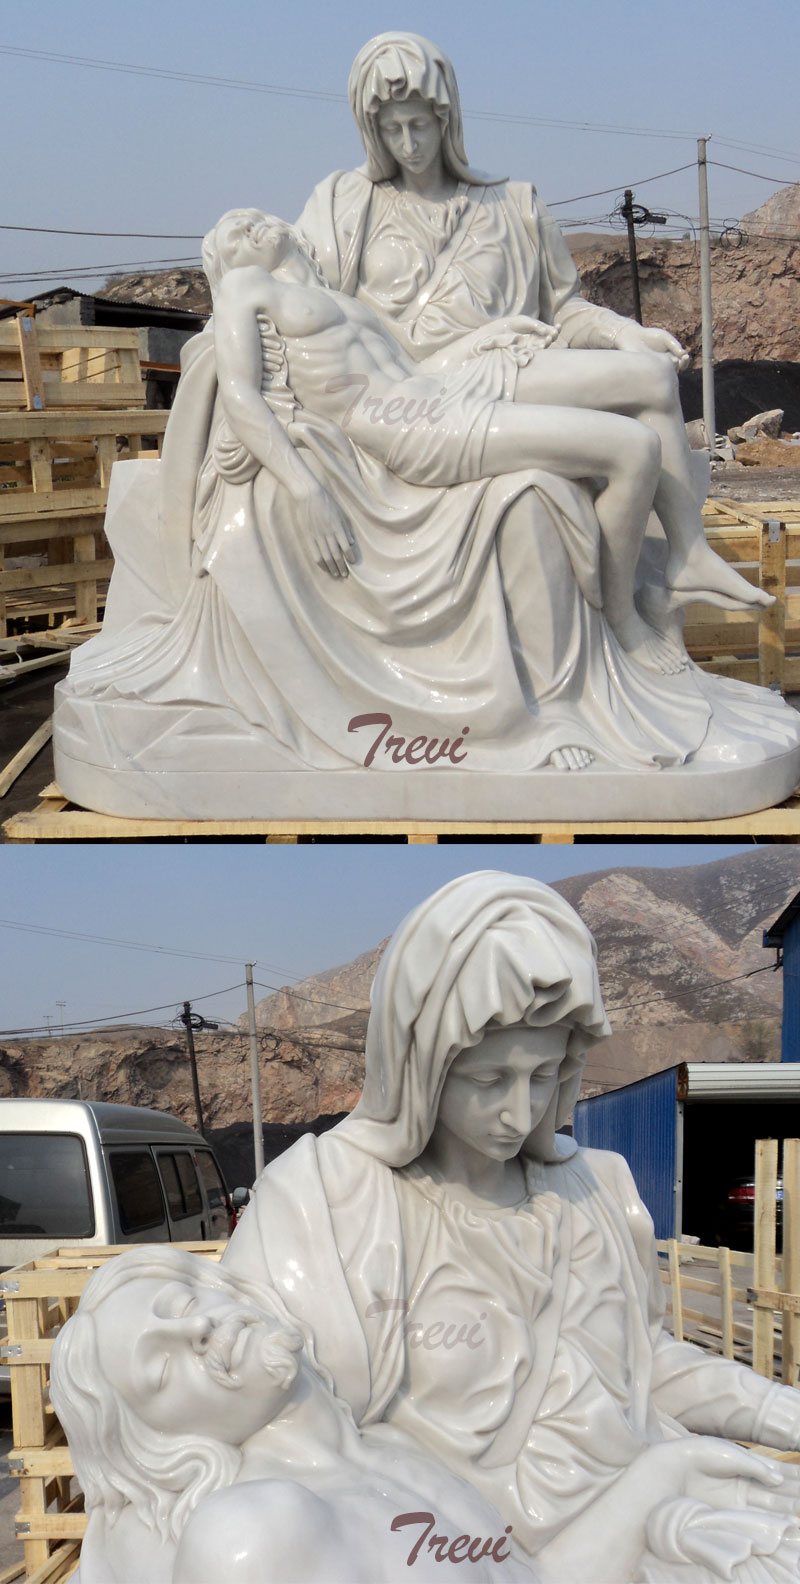 Church religious garden statues of Michelangelo's Pieta online design